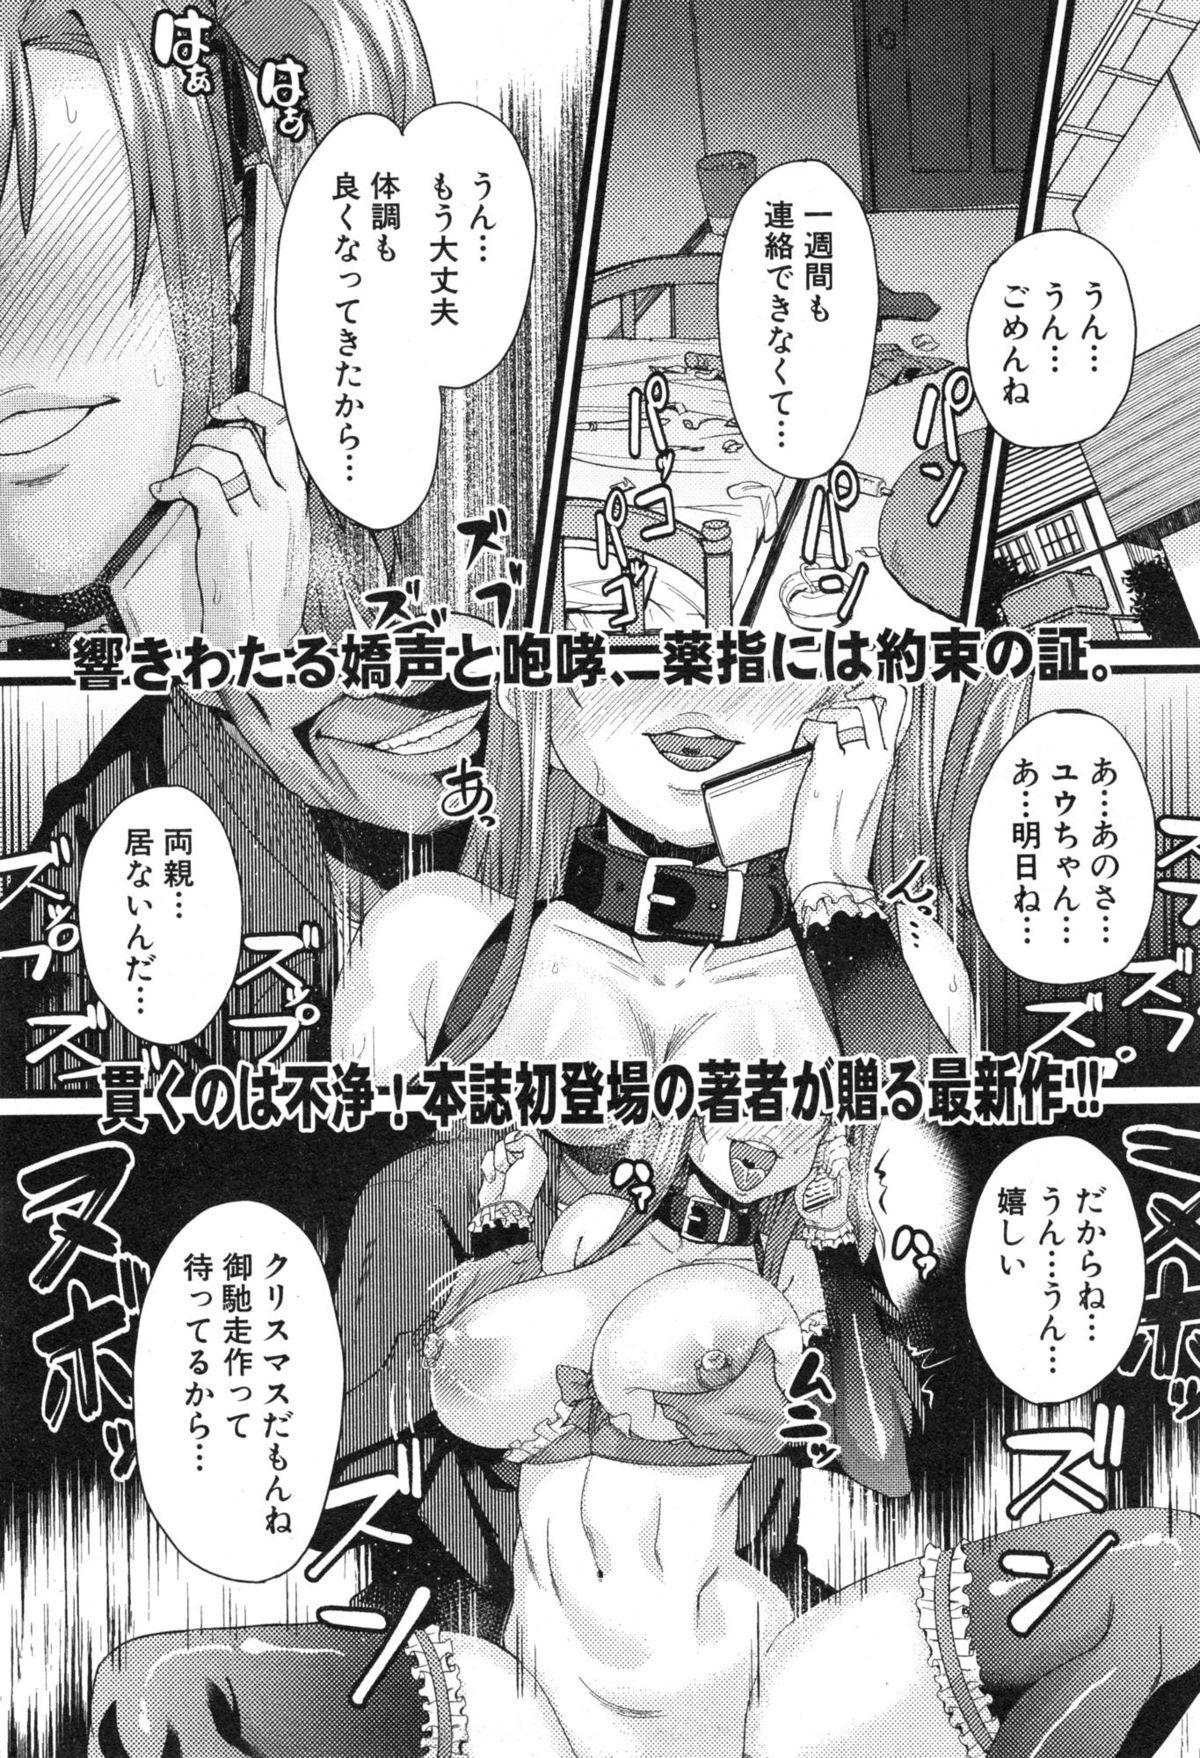 COMIC Shingeki 2015-01 310